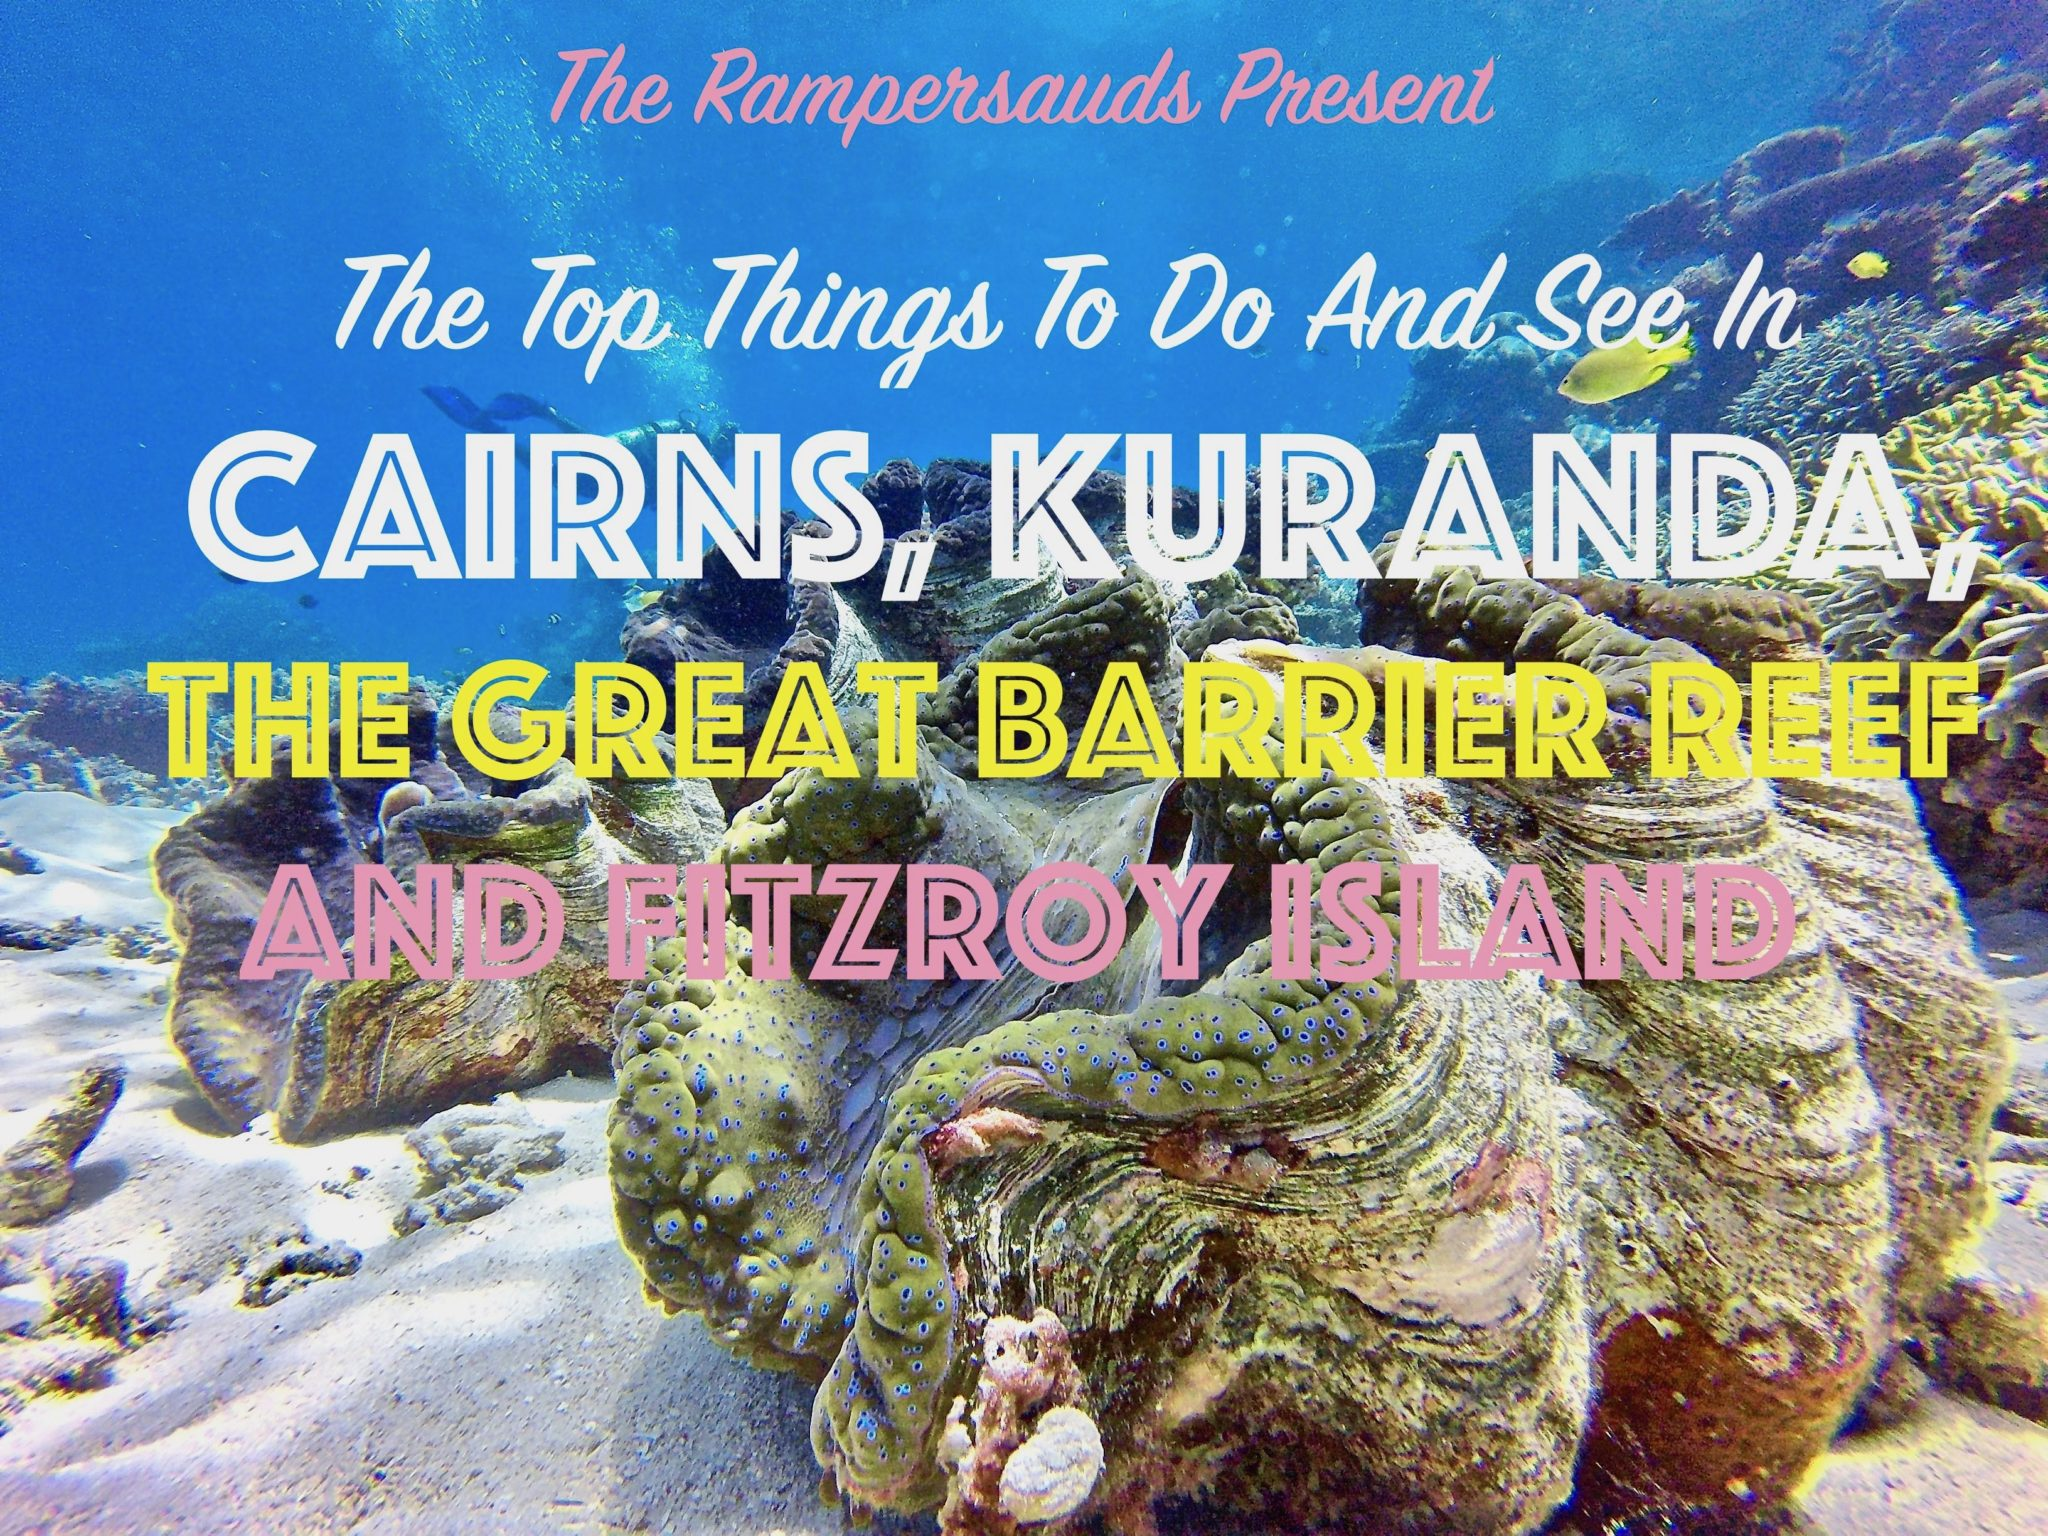 Cairns, Kuranda, Fitzroy and The Great Barrier Reef